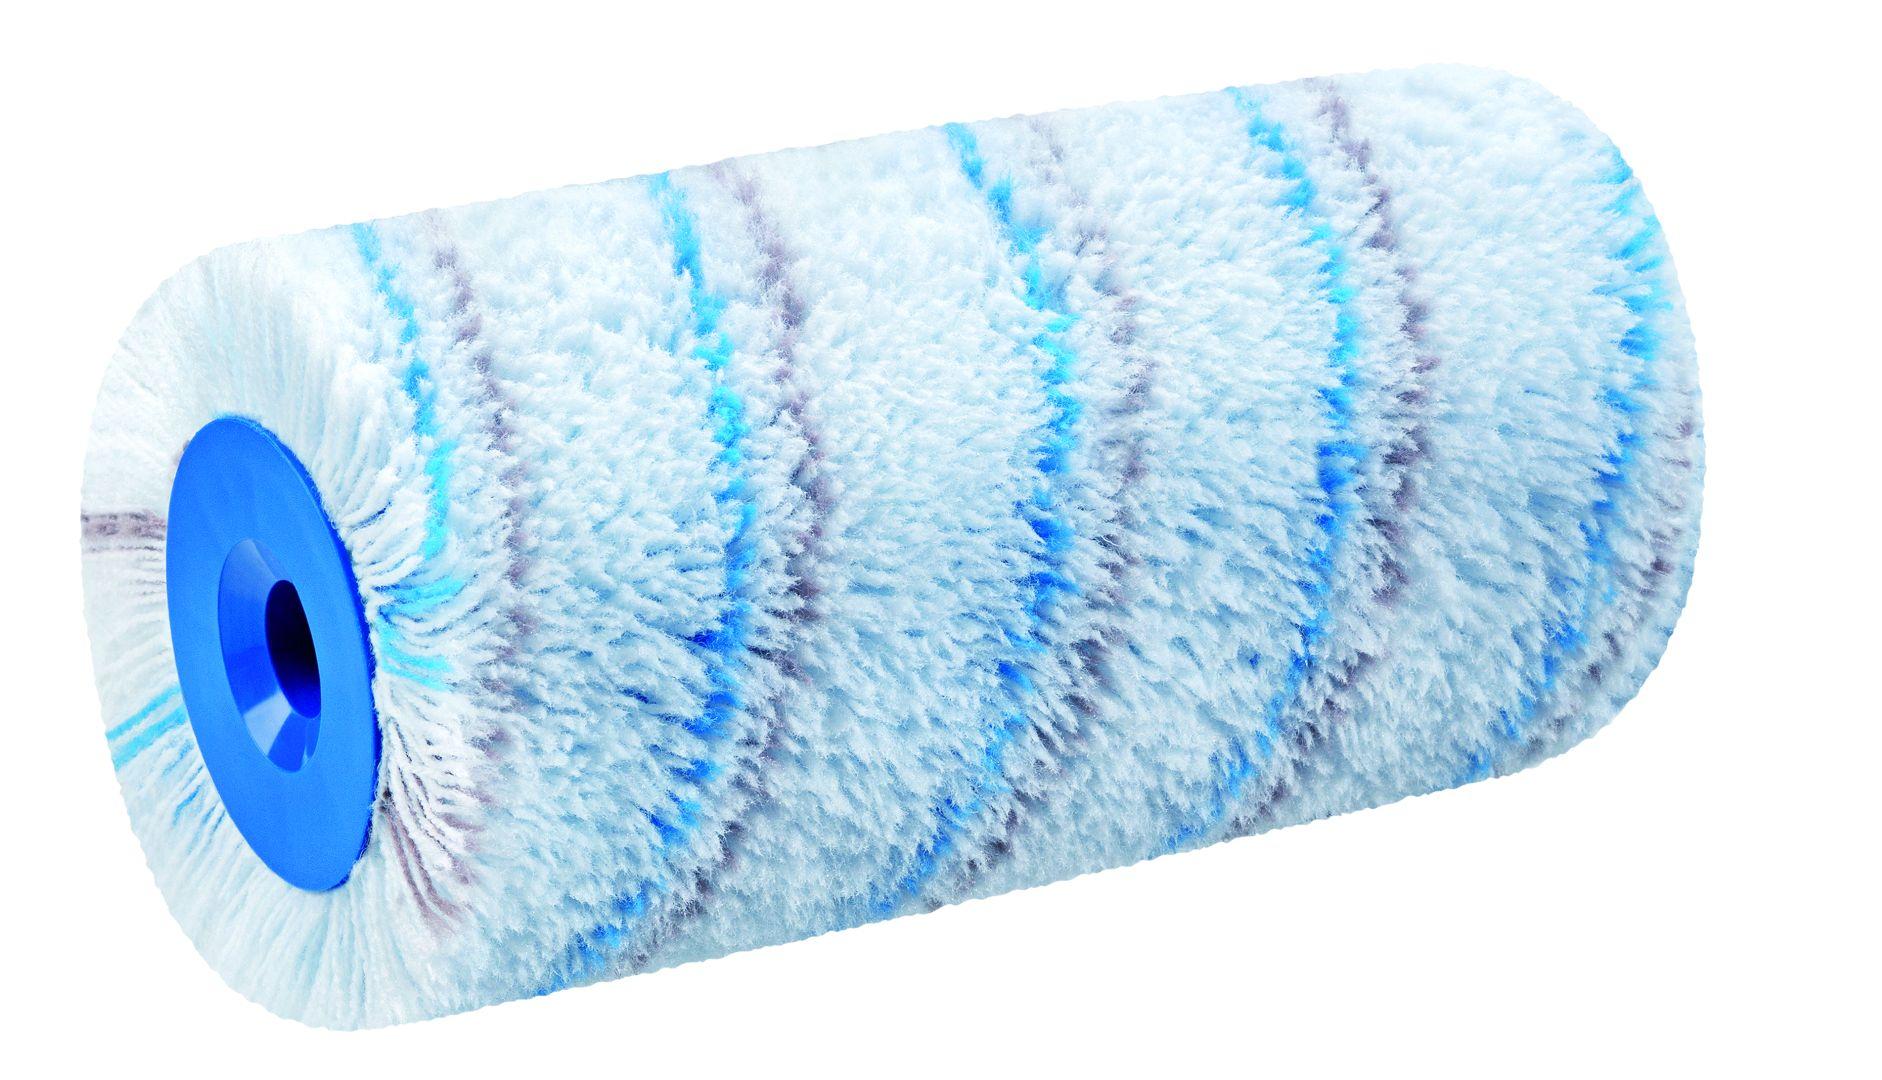 STORCH Walze, 25 cm, Polyamid, Multicolor, Blaugraufaden, SolidXL, Kern-Ø 60